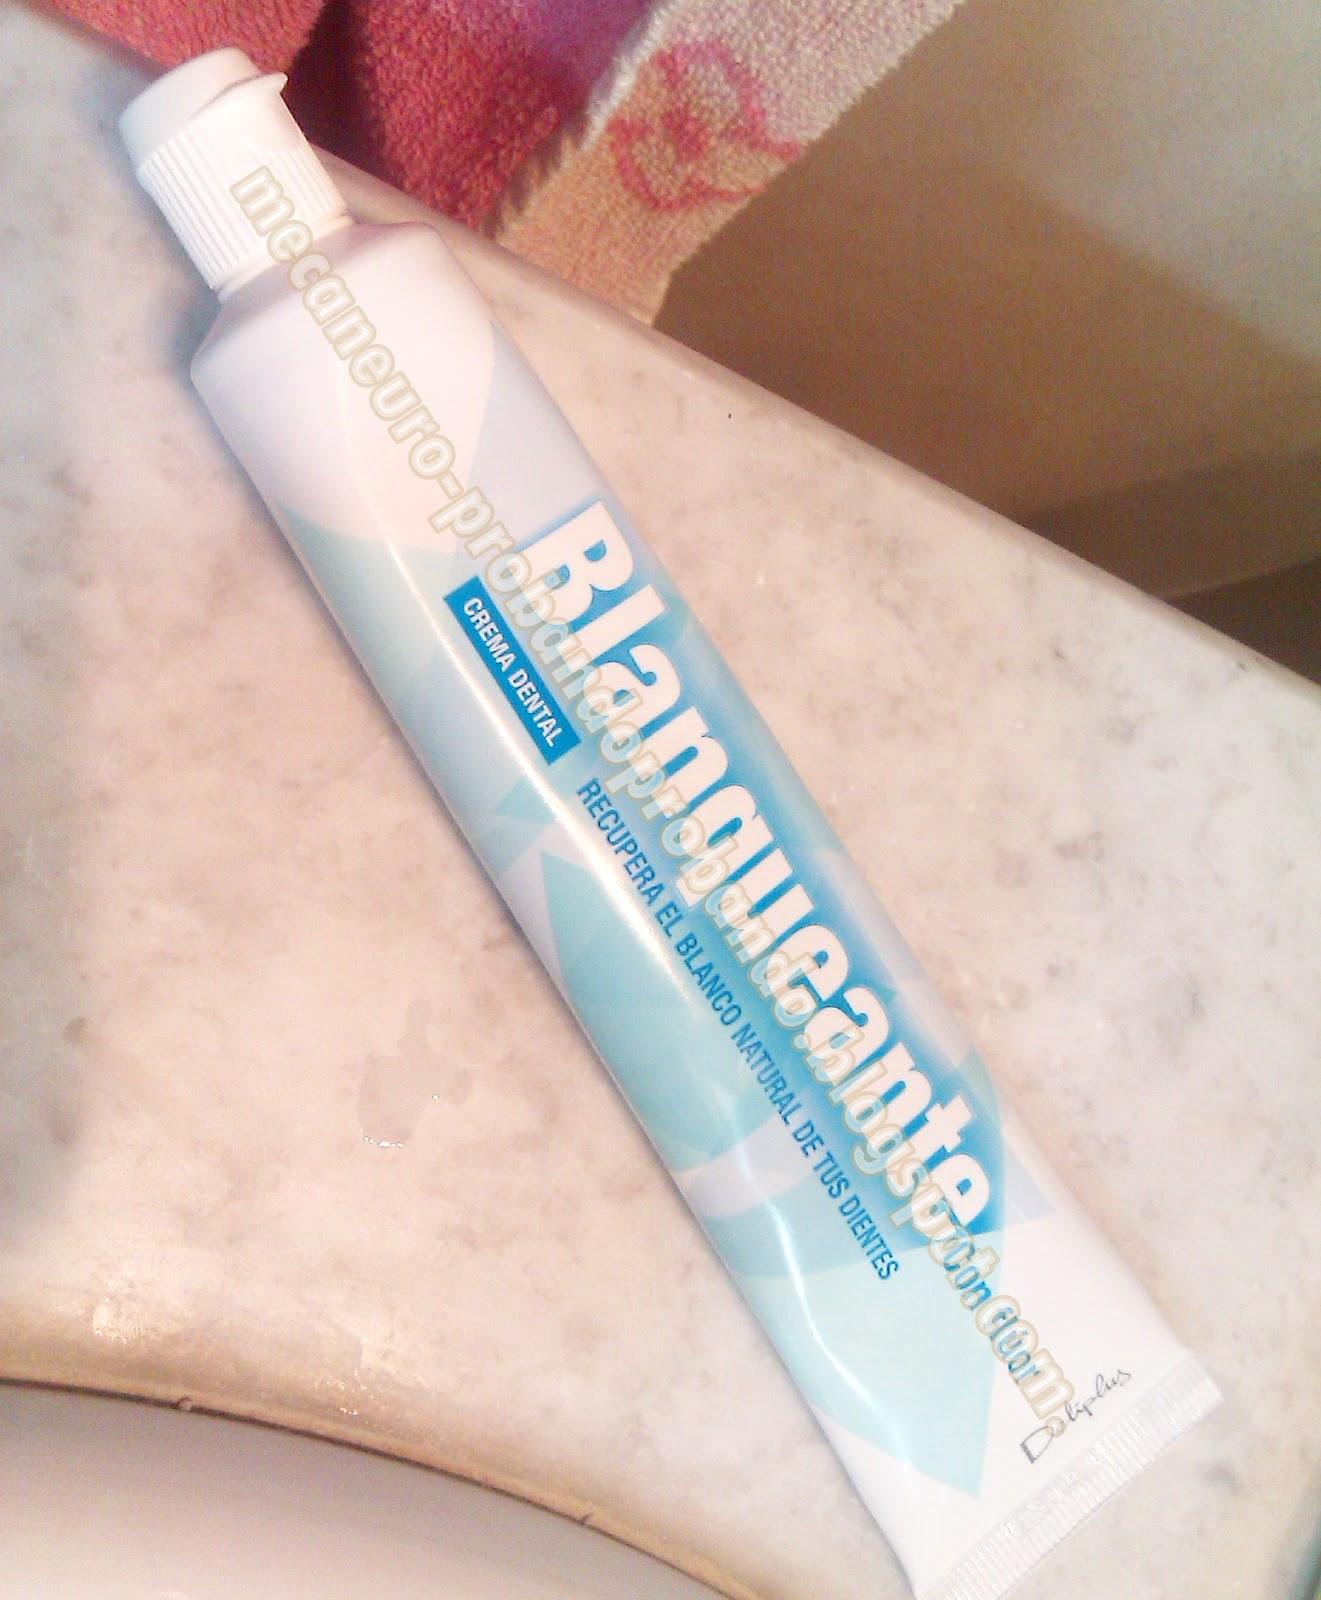 kit blanqueamiento dental mercadona